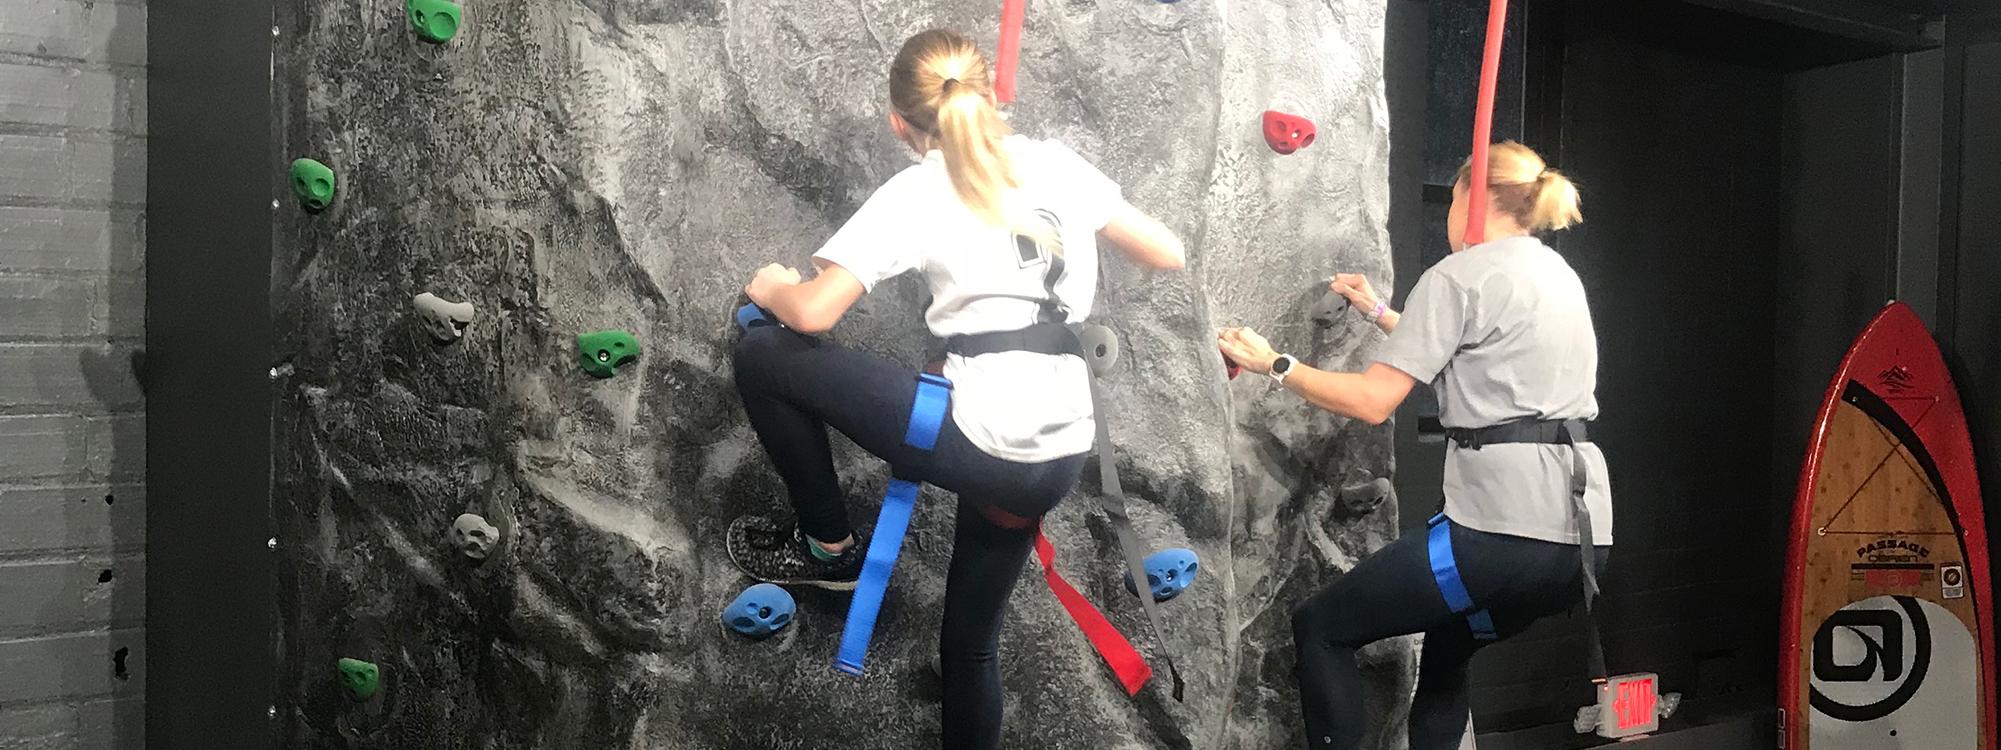 Climb the wall Paddle & Climb